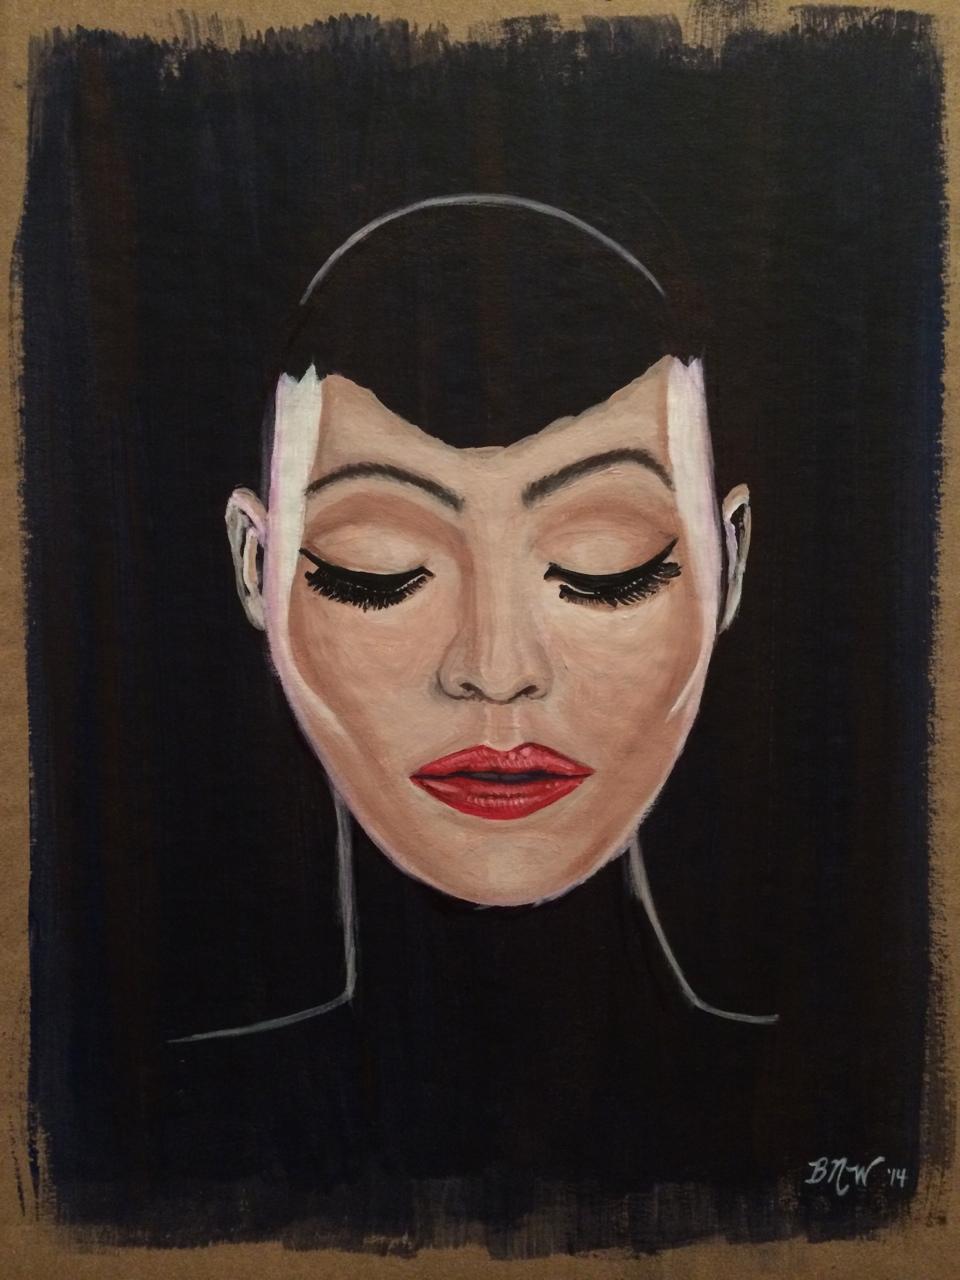 The Mask   2014. Acrylic on cardboard. 18 x 11.